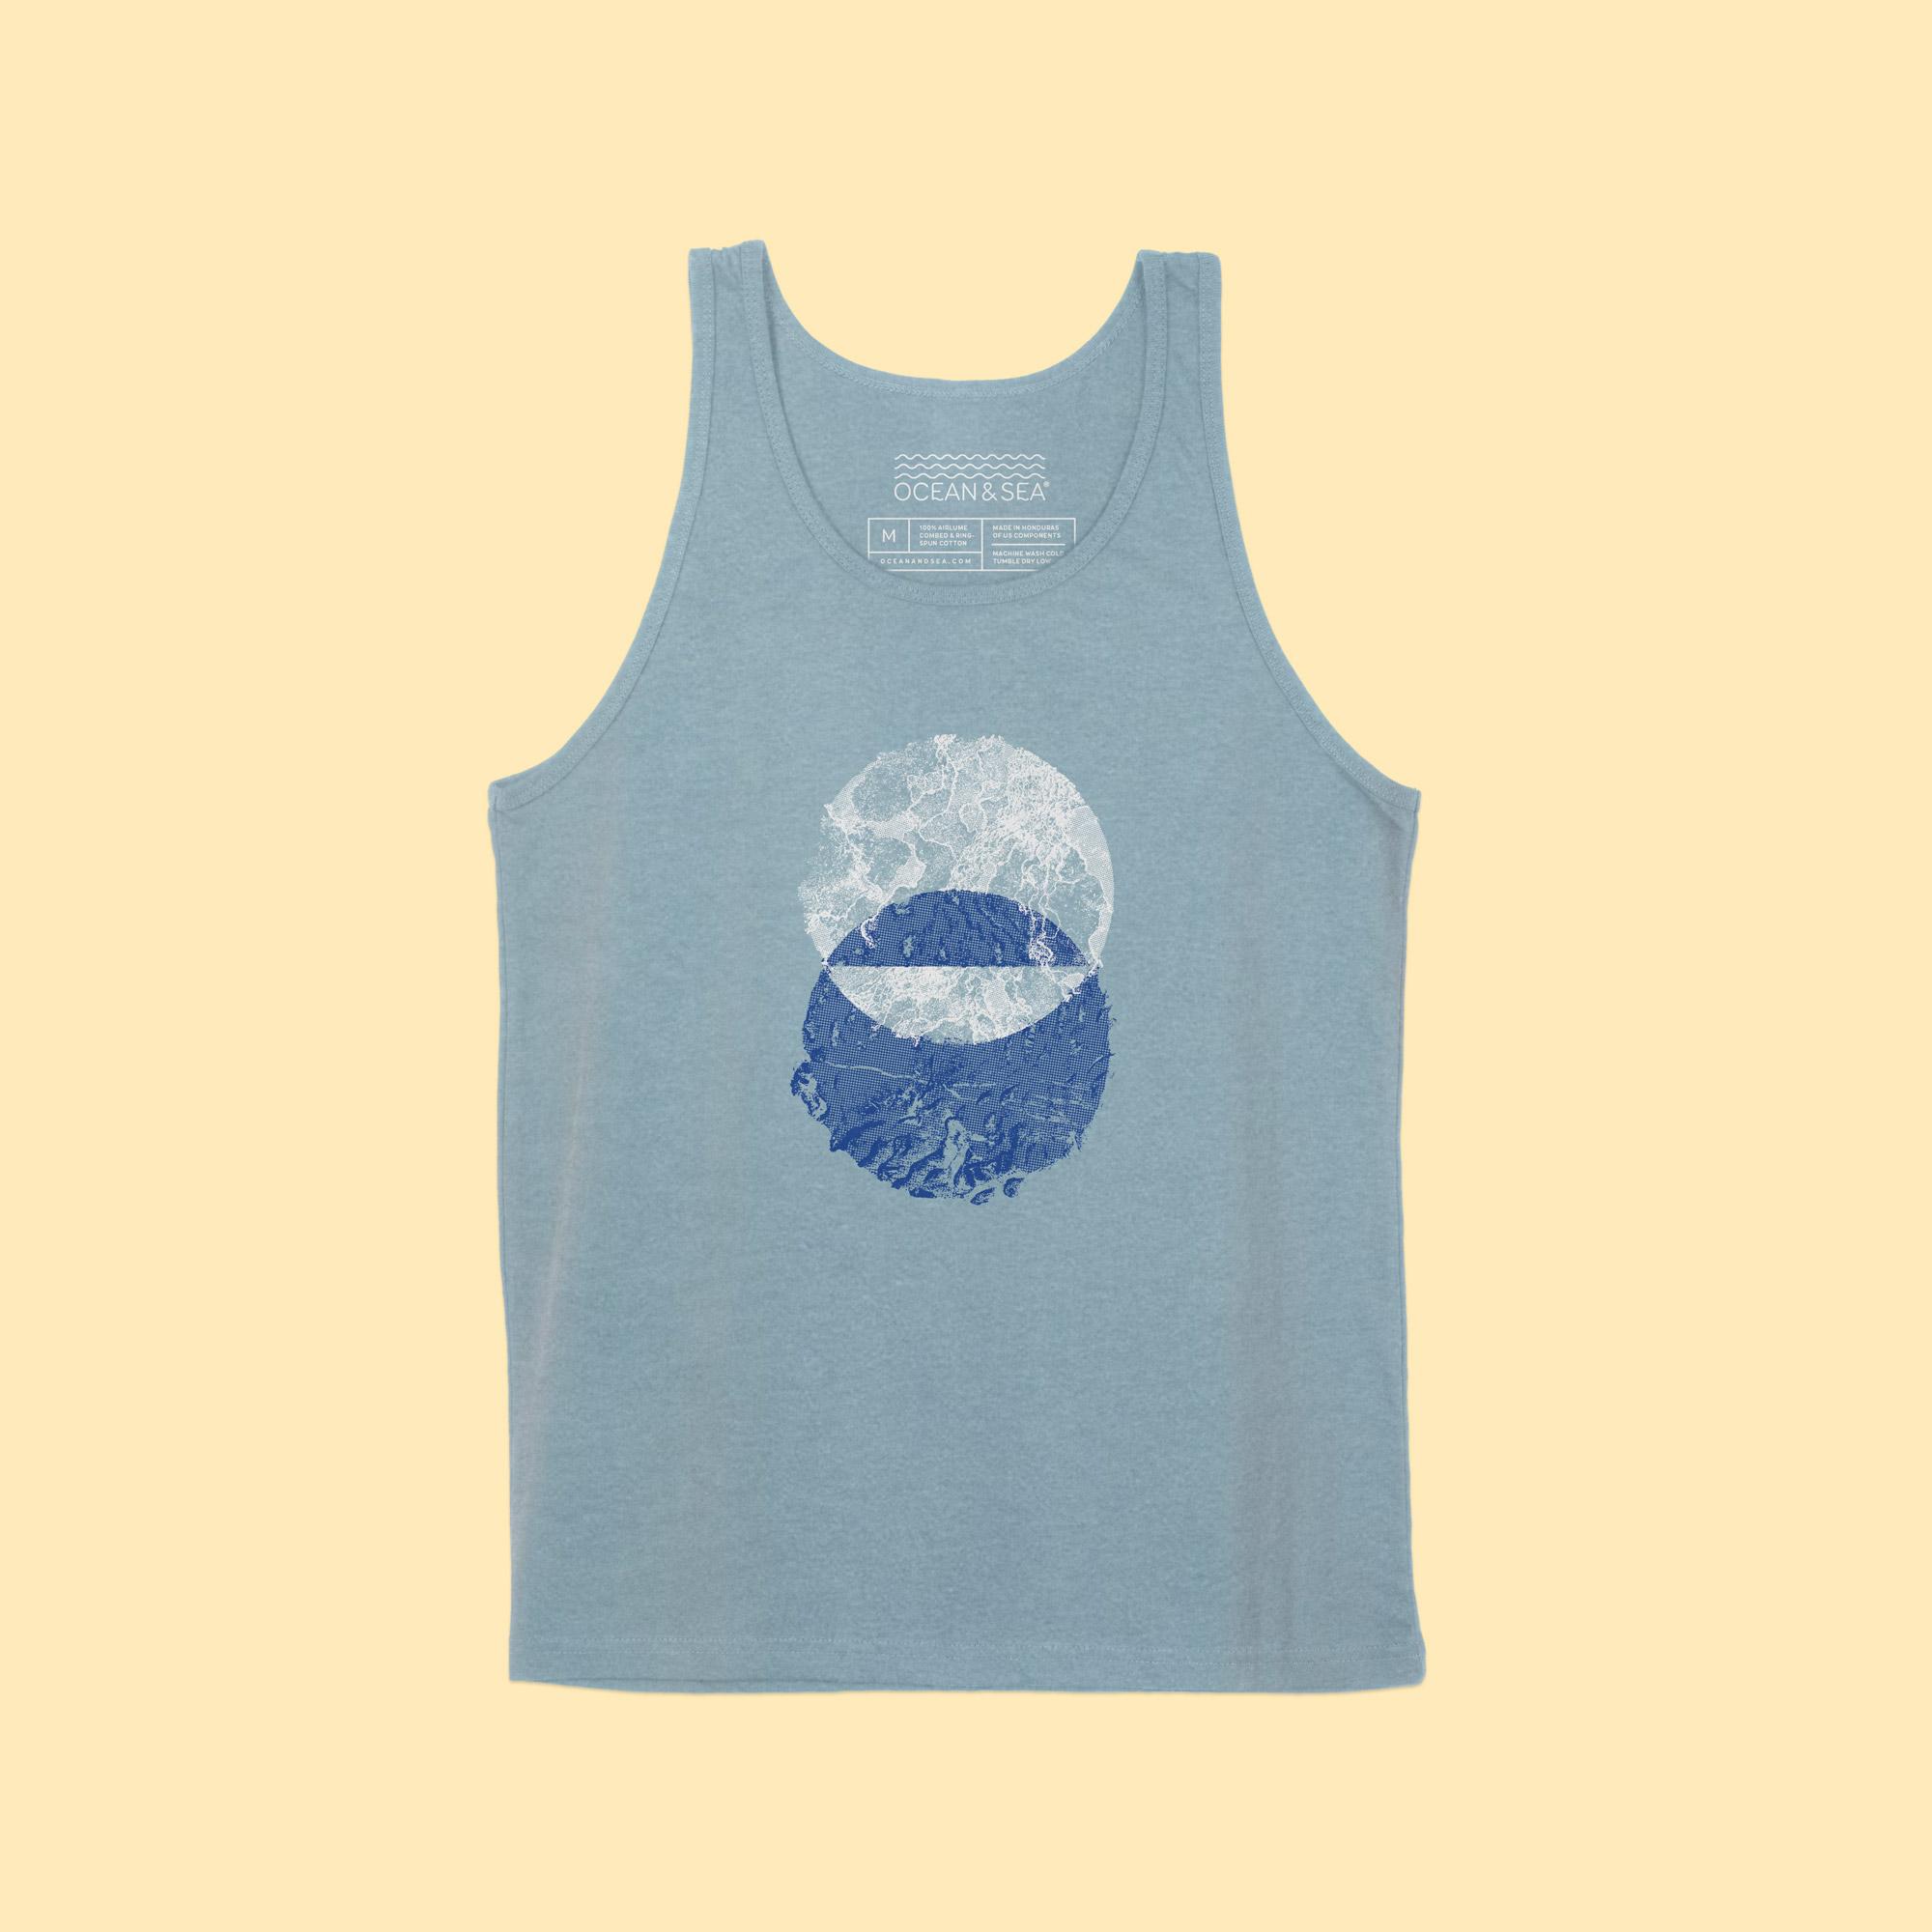 Ocean-and-Sea_T-Shirt_Mandorla_Mockup